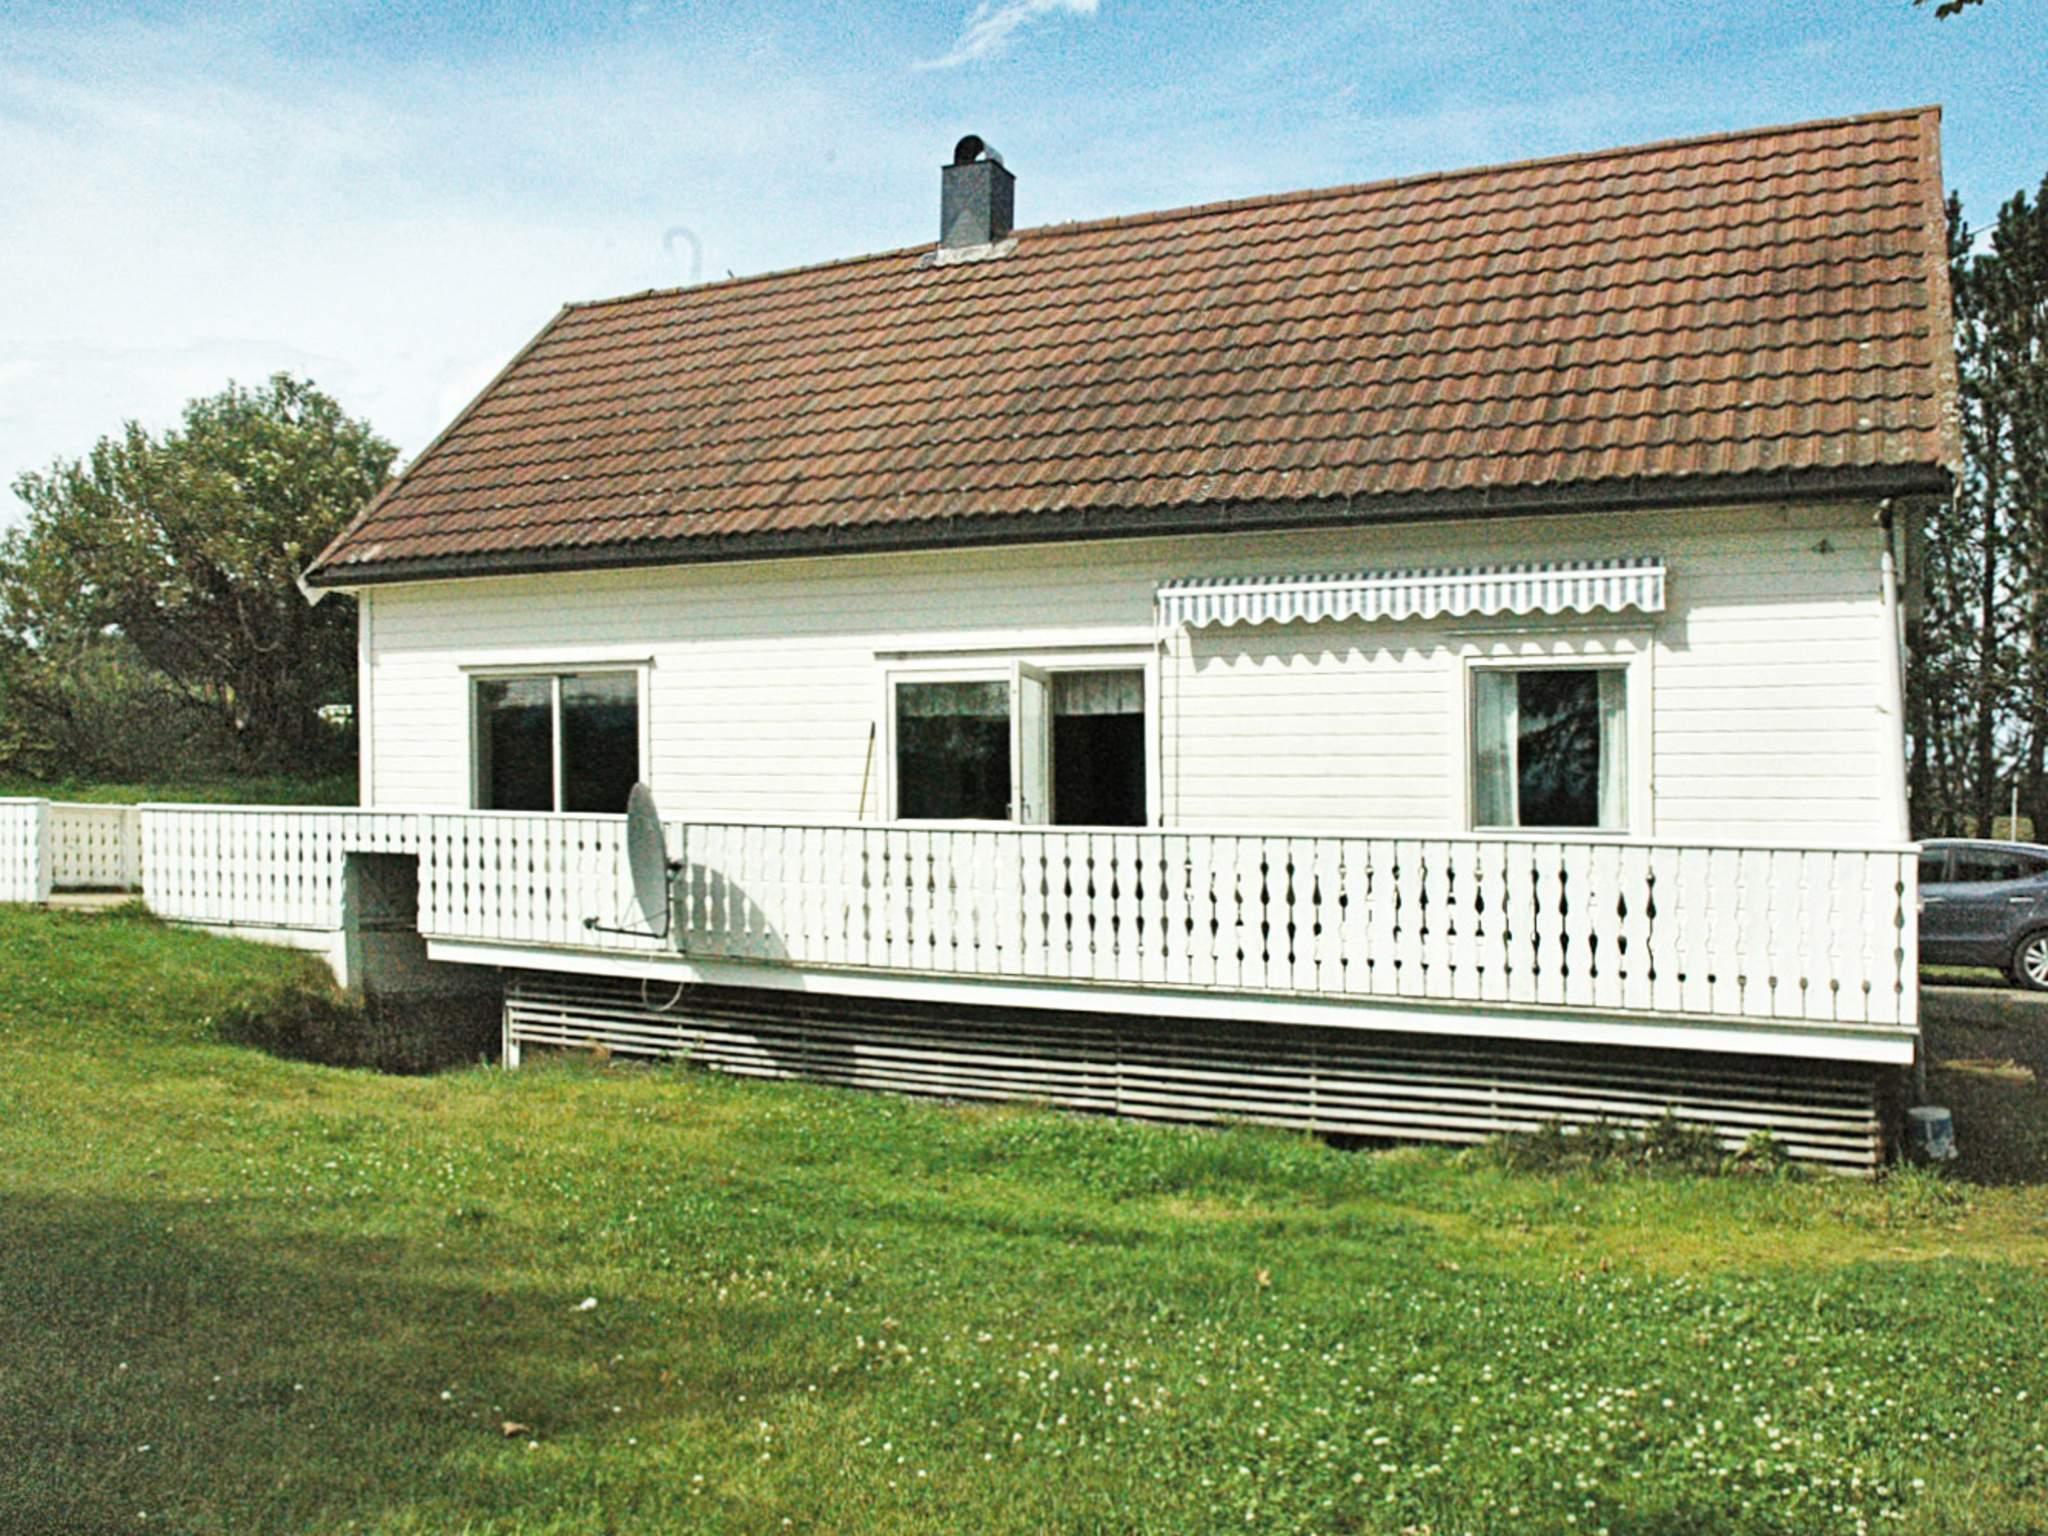 Ferienhaus Vevang (85080), Vevang, More - Romsdal, Westnorwegen, Norwegen, Bild 23